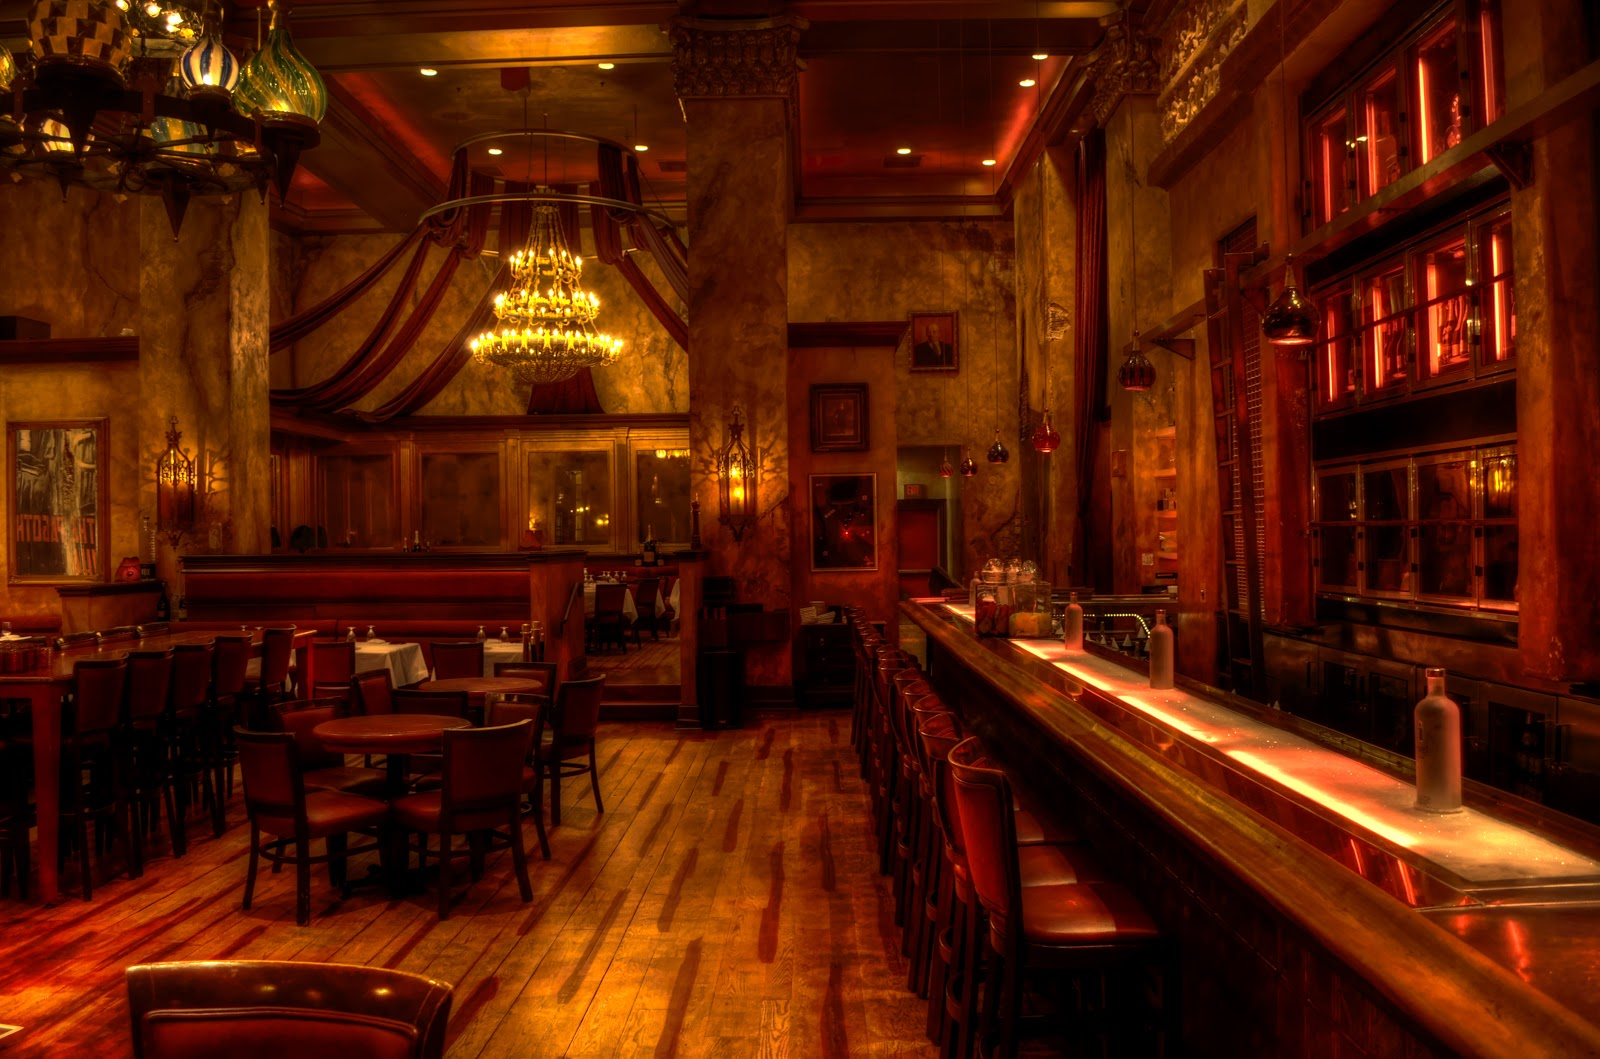 Tag sports bar planet hollywood resort extra bet3 65 lounge paris las vegas